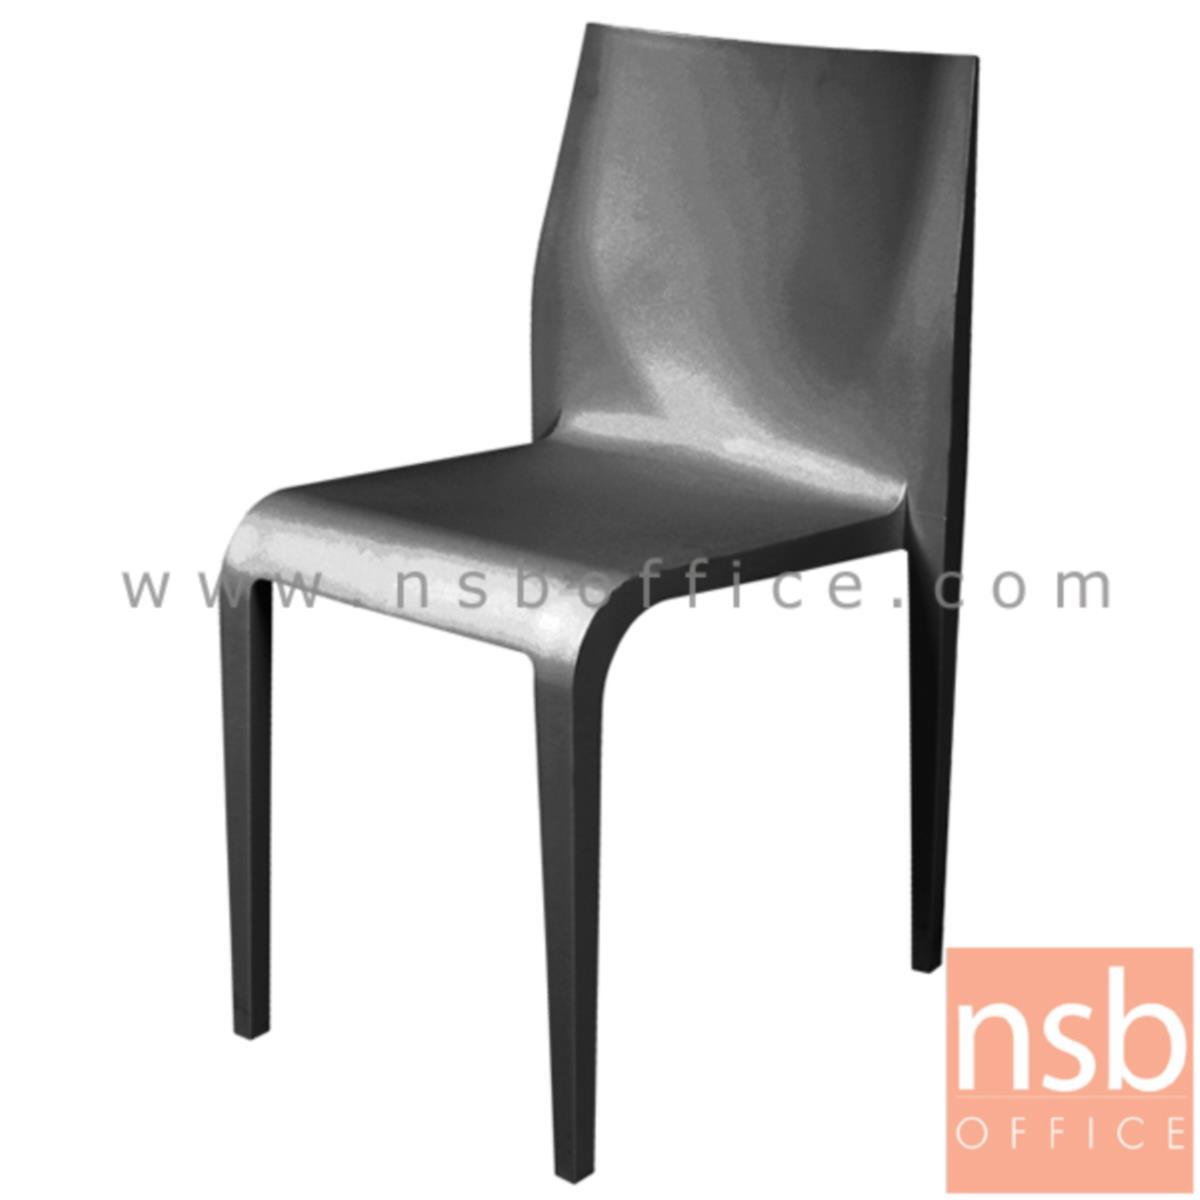 B29A057:เก้าอี้โมเดิร์นพลาสติกล้วน(PP) รุ่น PP9213 ขนาด 43.5W cm.